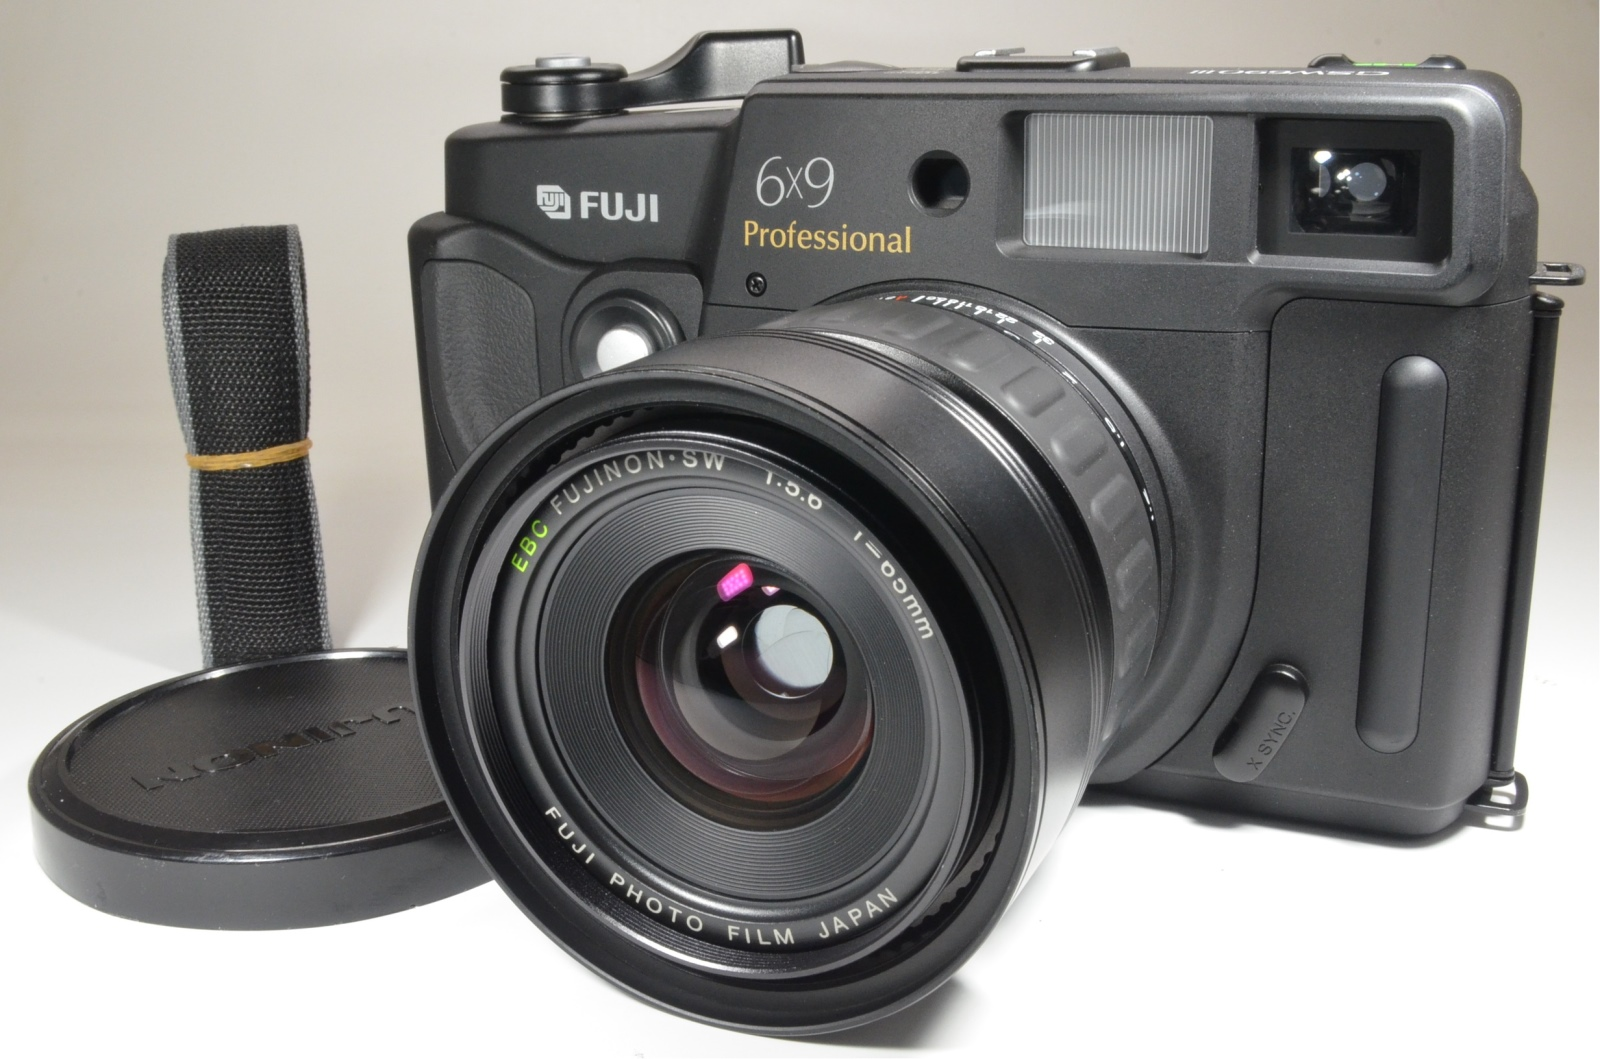 fuji fujifilm gsw690iii 65mm f5.6 count '015' medium format camera